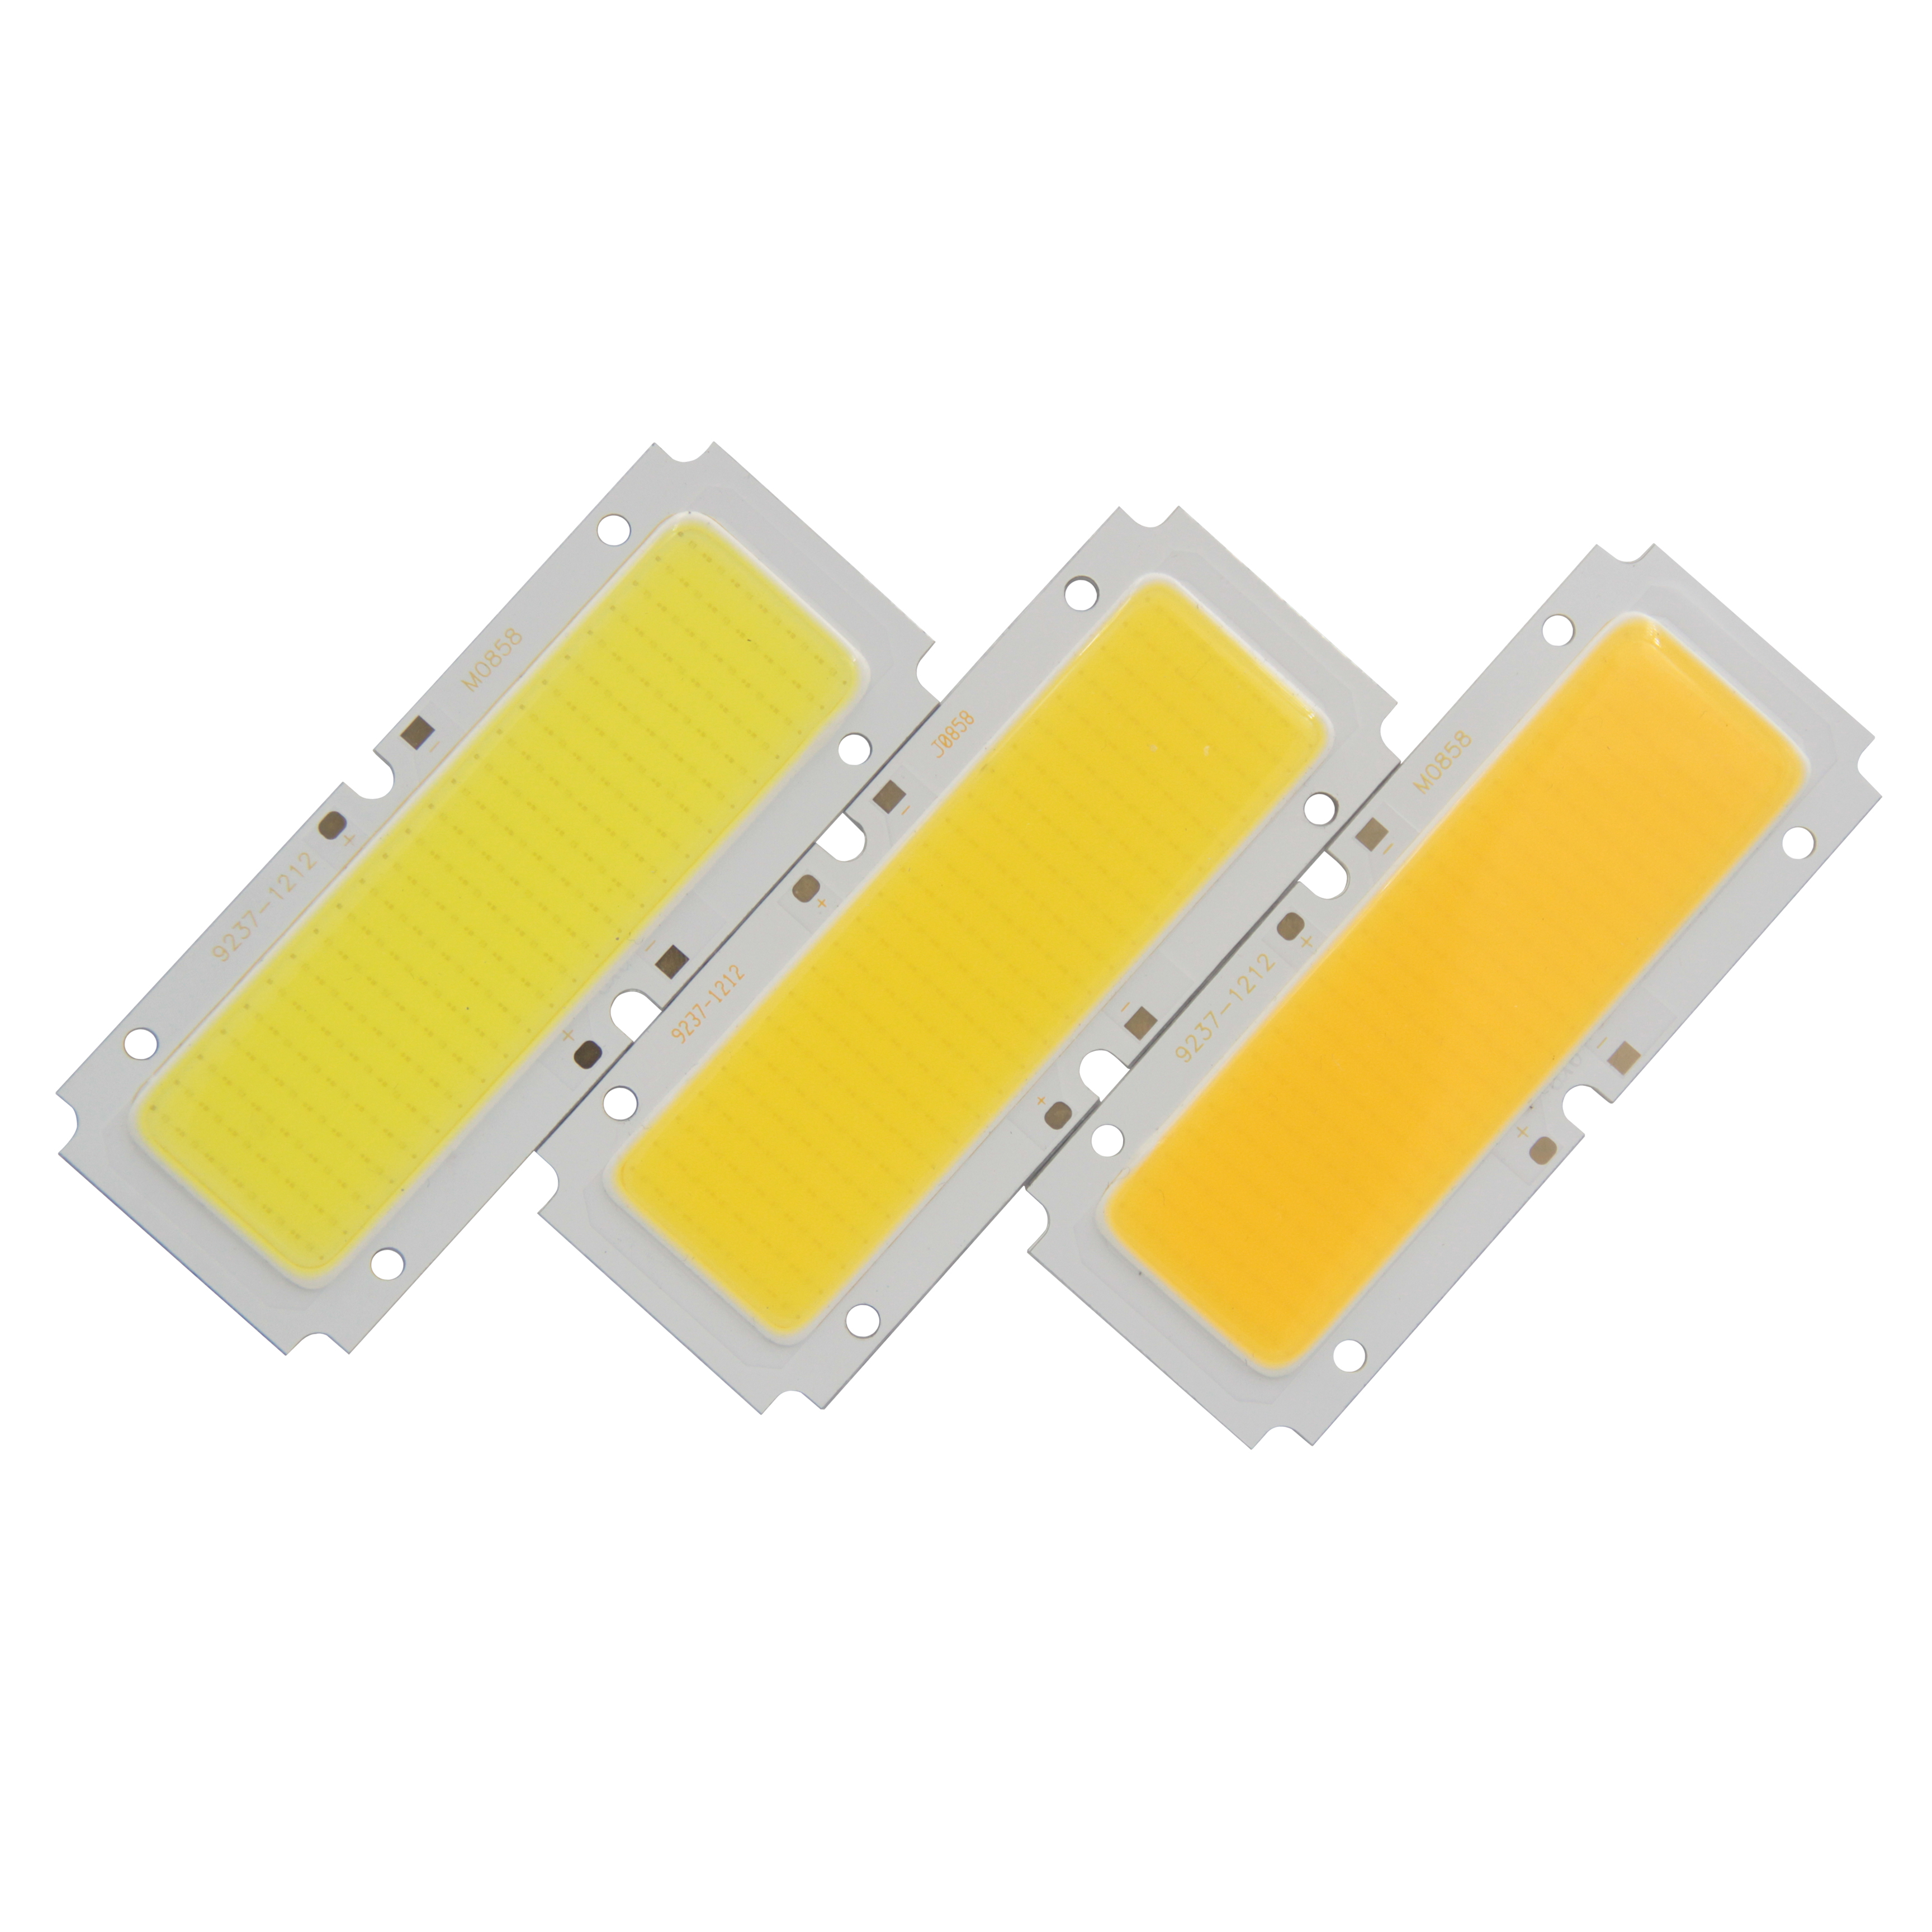 Купить с кэшбэком hot sale 92mm 37mm LED COB Light Source High Power 30W 36V DC nature Warm White LED Strip Chip Module For DownLight DIY lamp